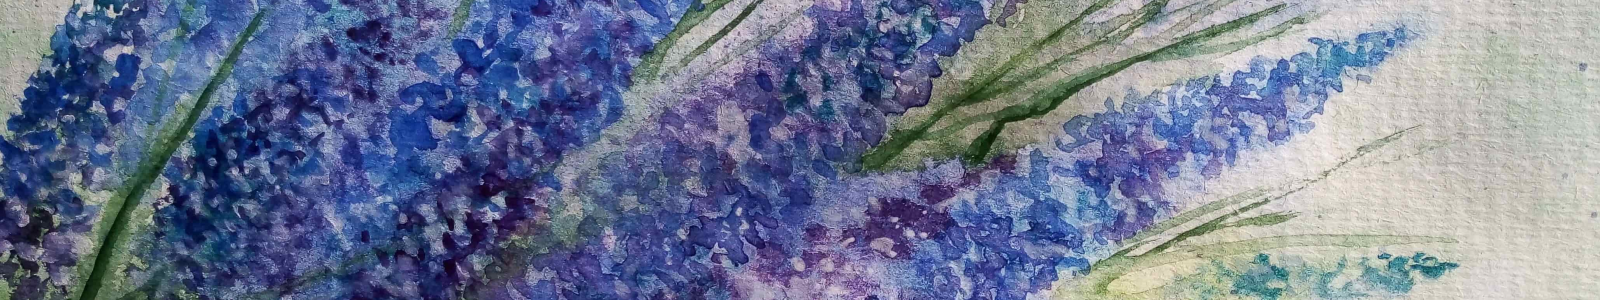 Gallery Painter Nataliia Liamina